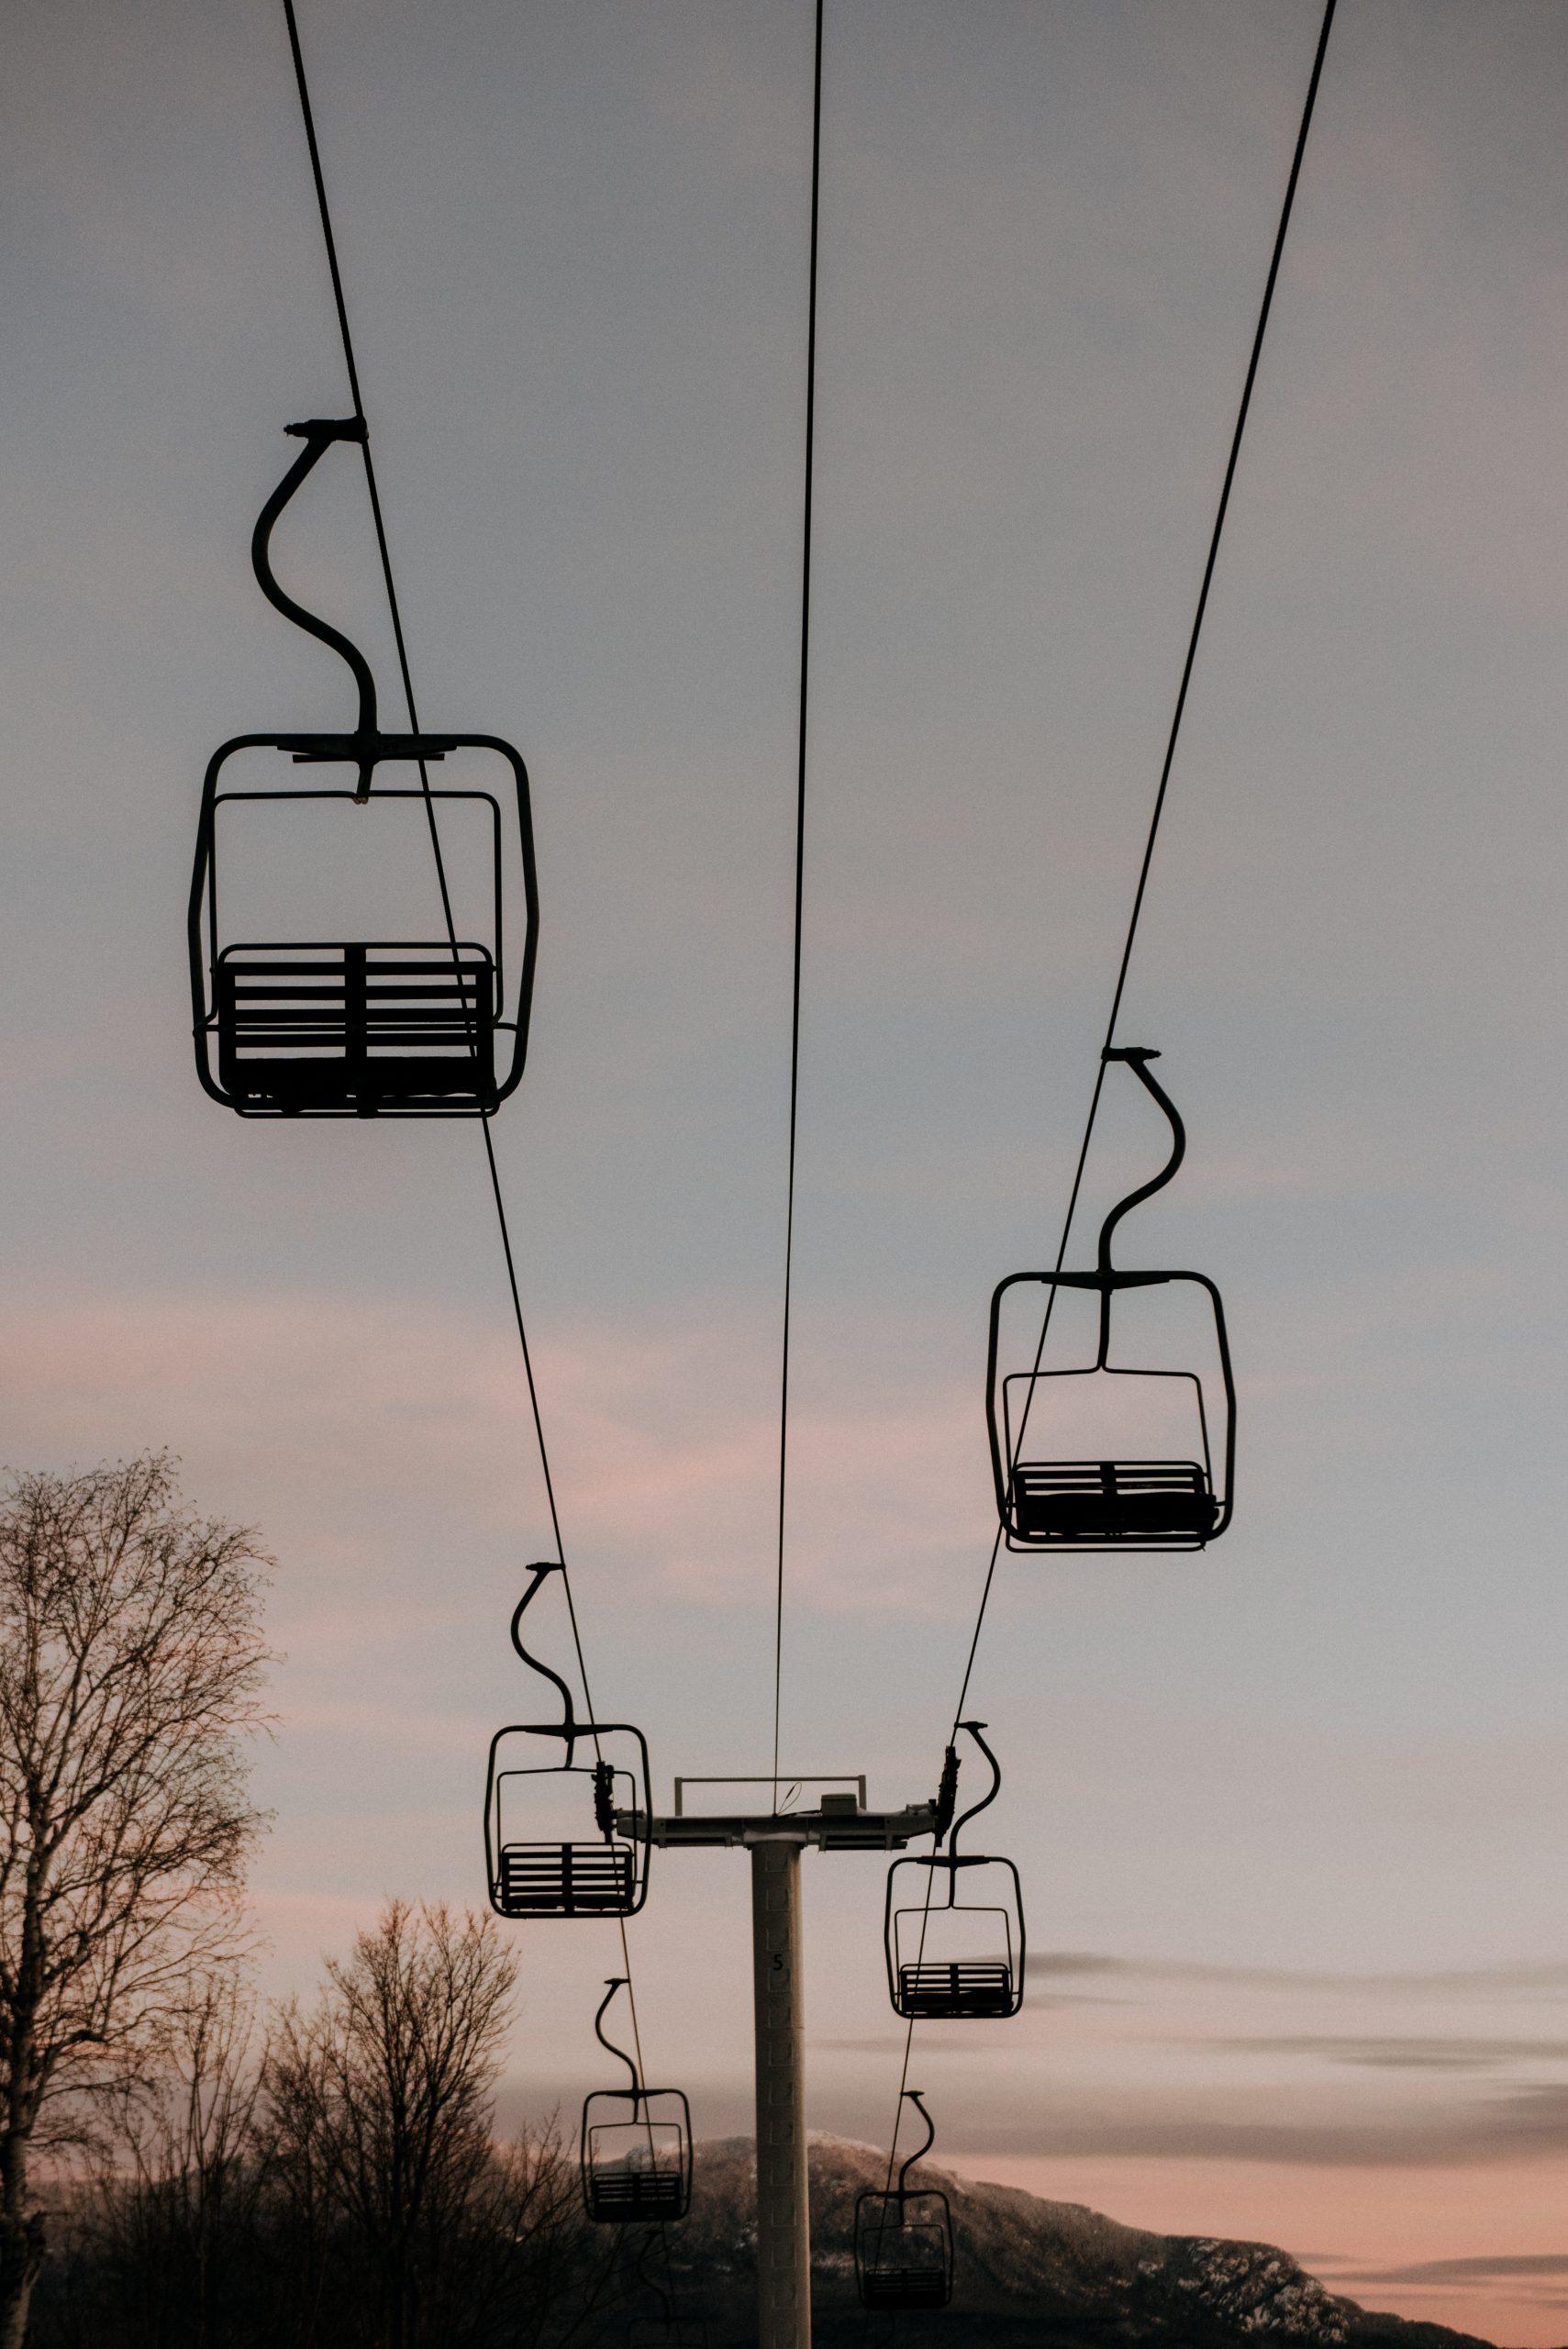 Ski lifts at sunrise